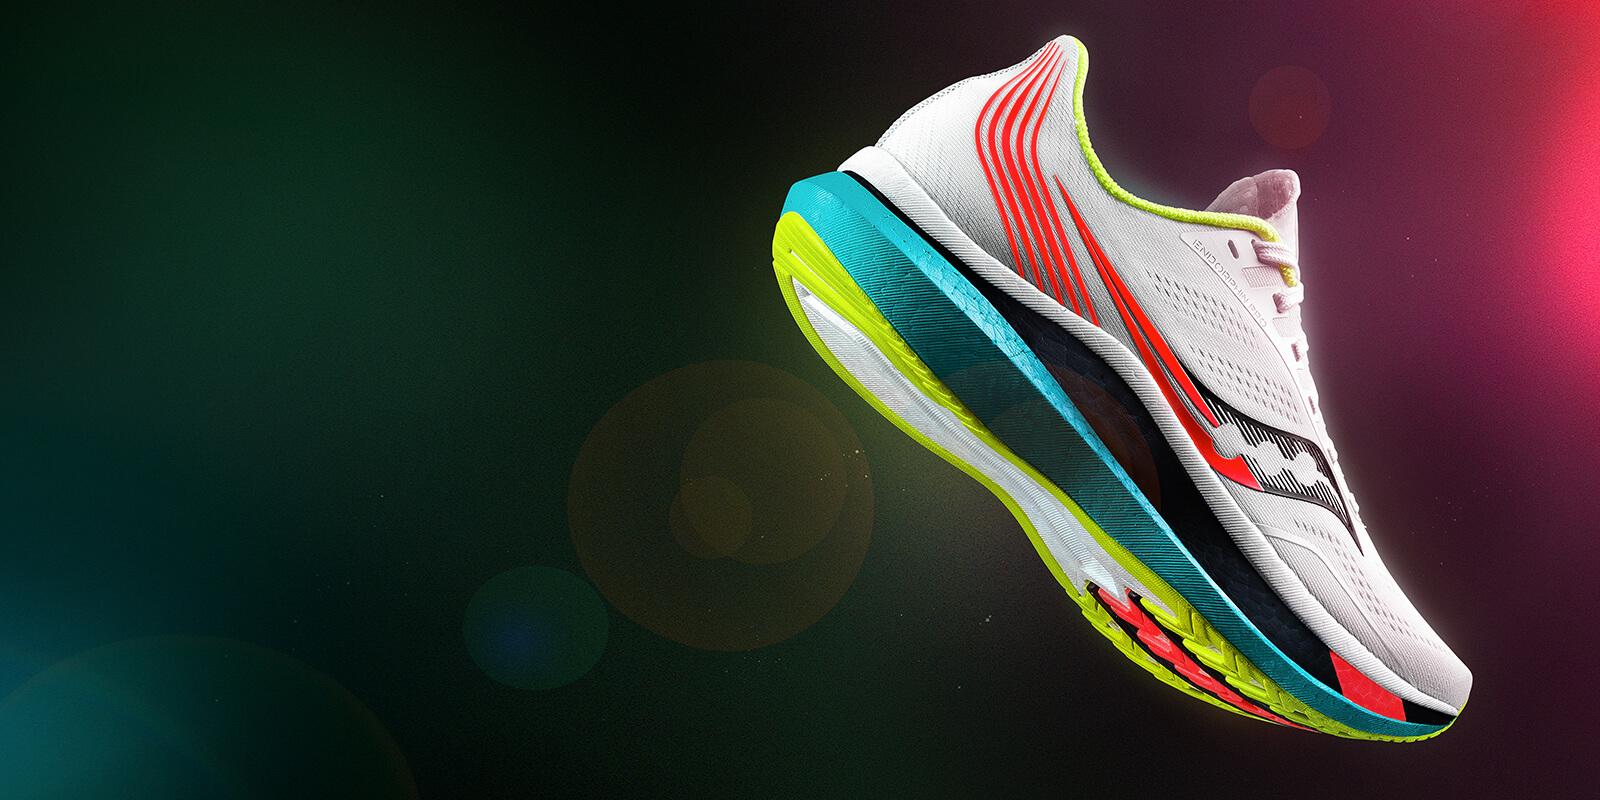 saucony runners ireland, OFF 79%,Free